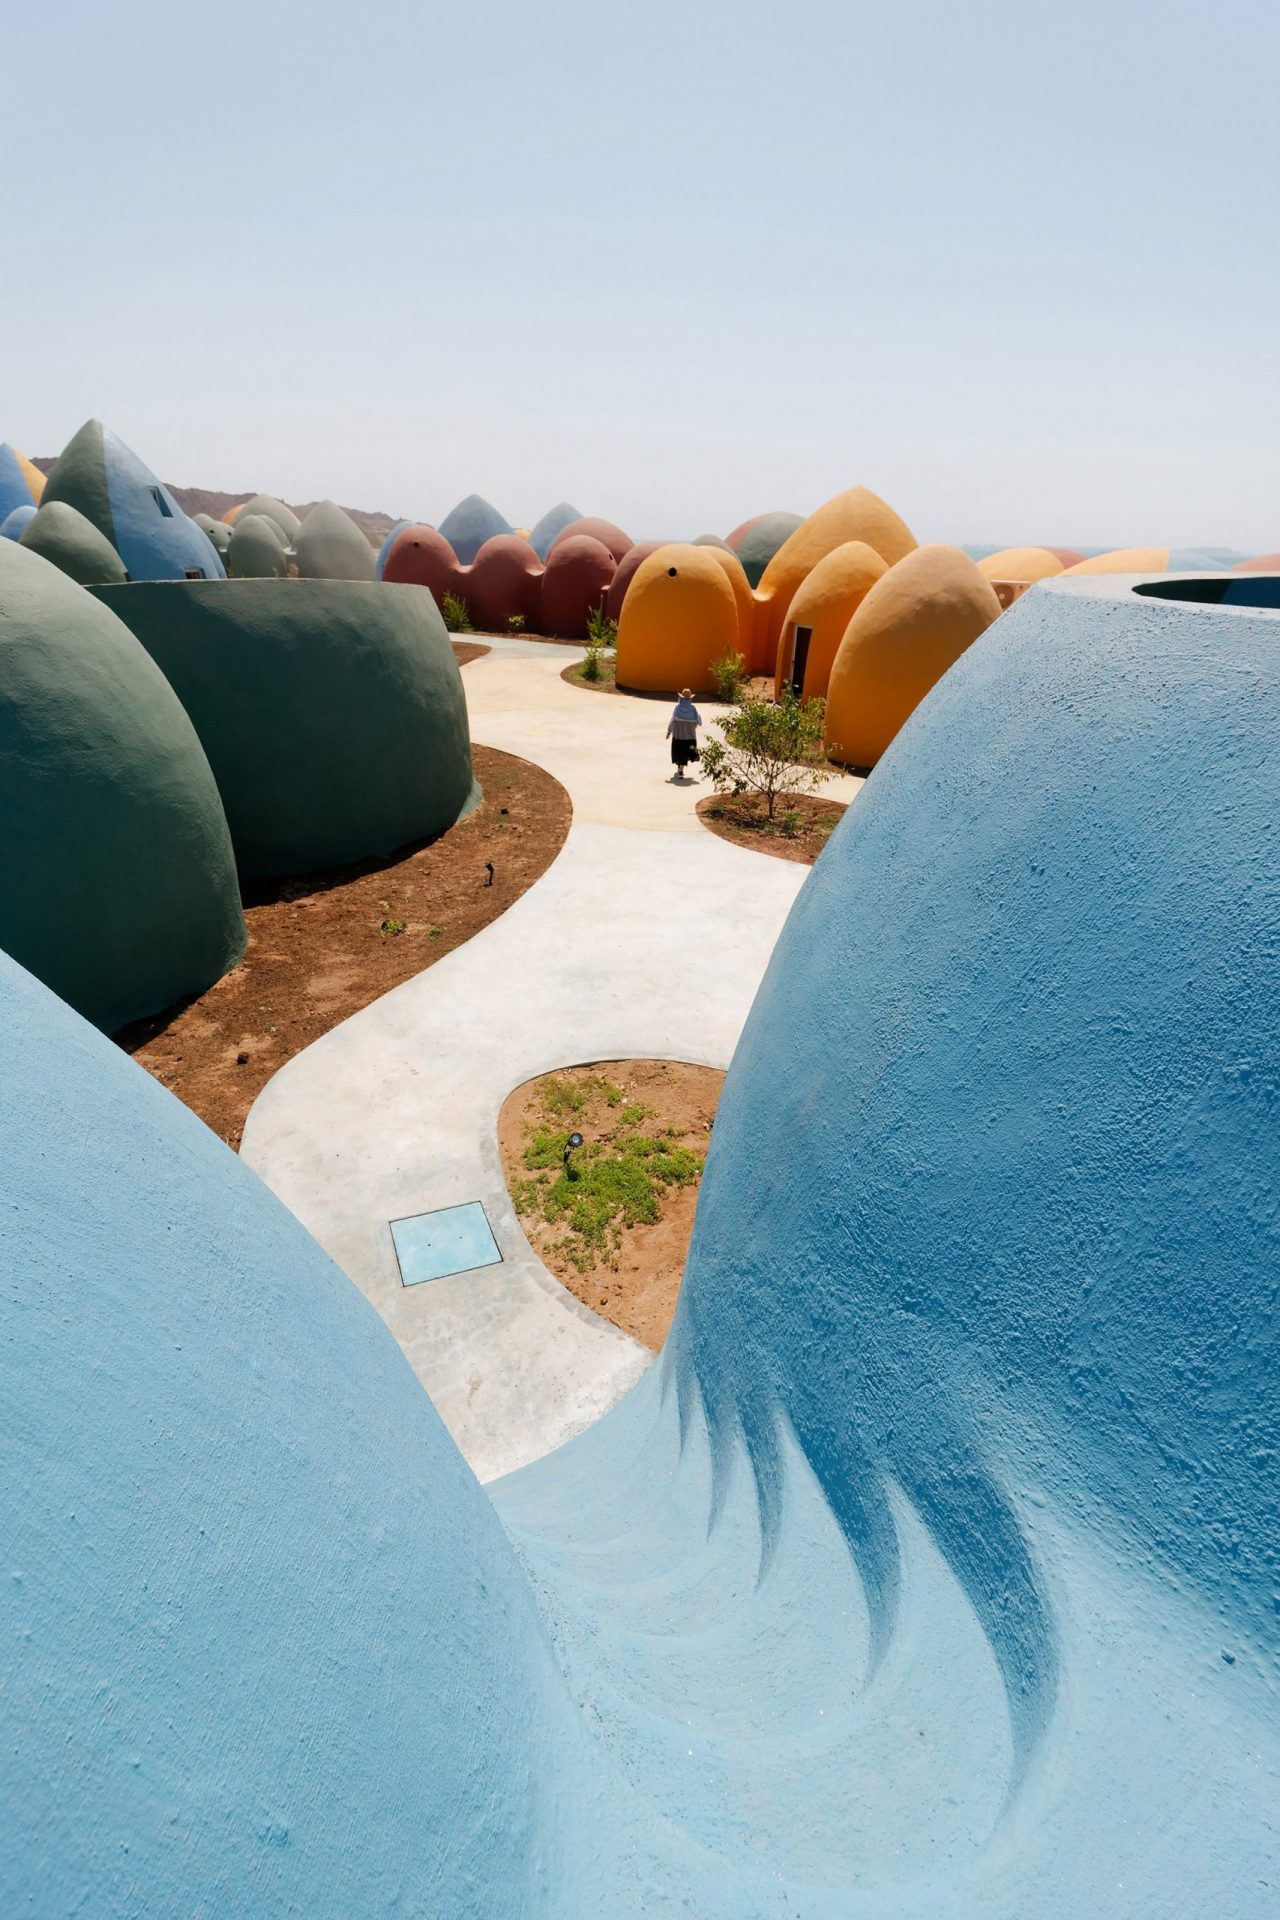 zav_architects_iran_hormuz_island_designalive-8